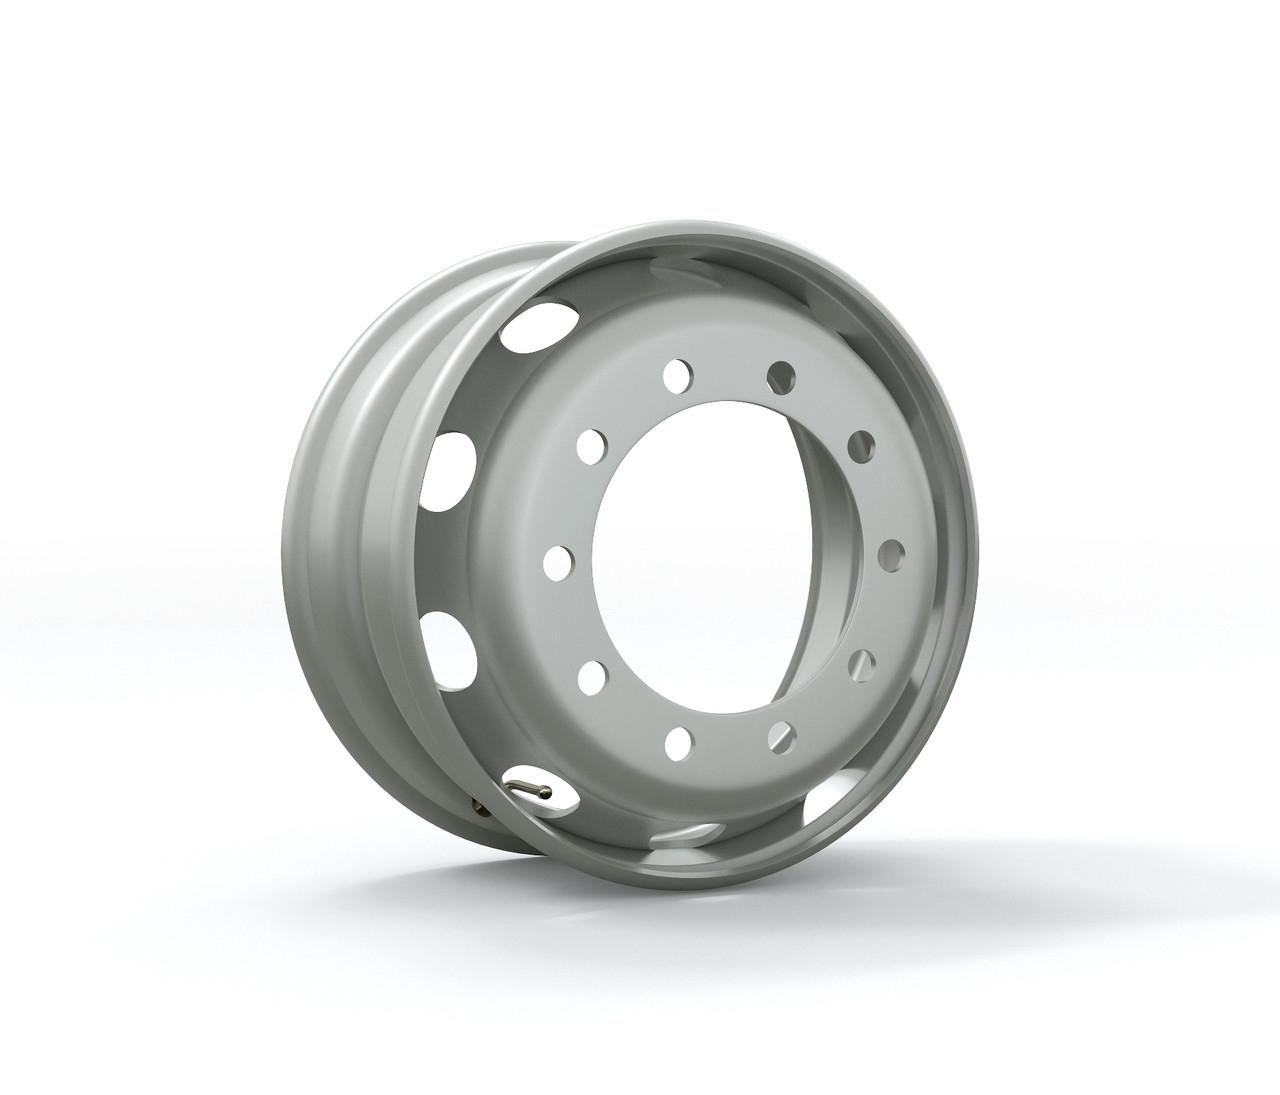 Диск колесный 11.75х22.5 А=120 (под диск) photo